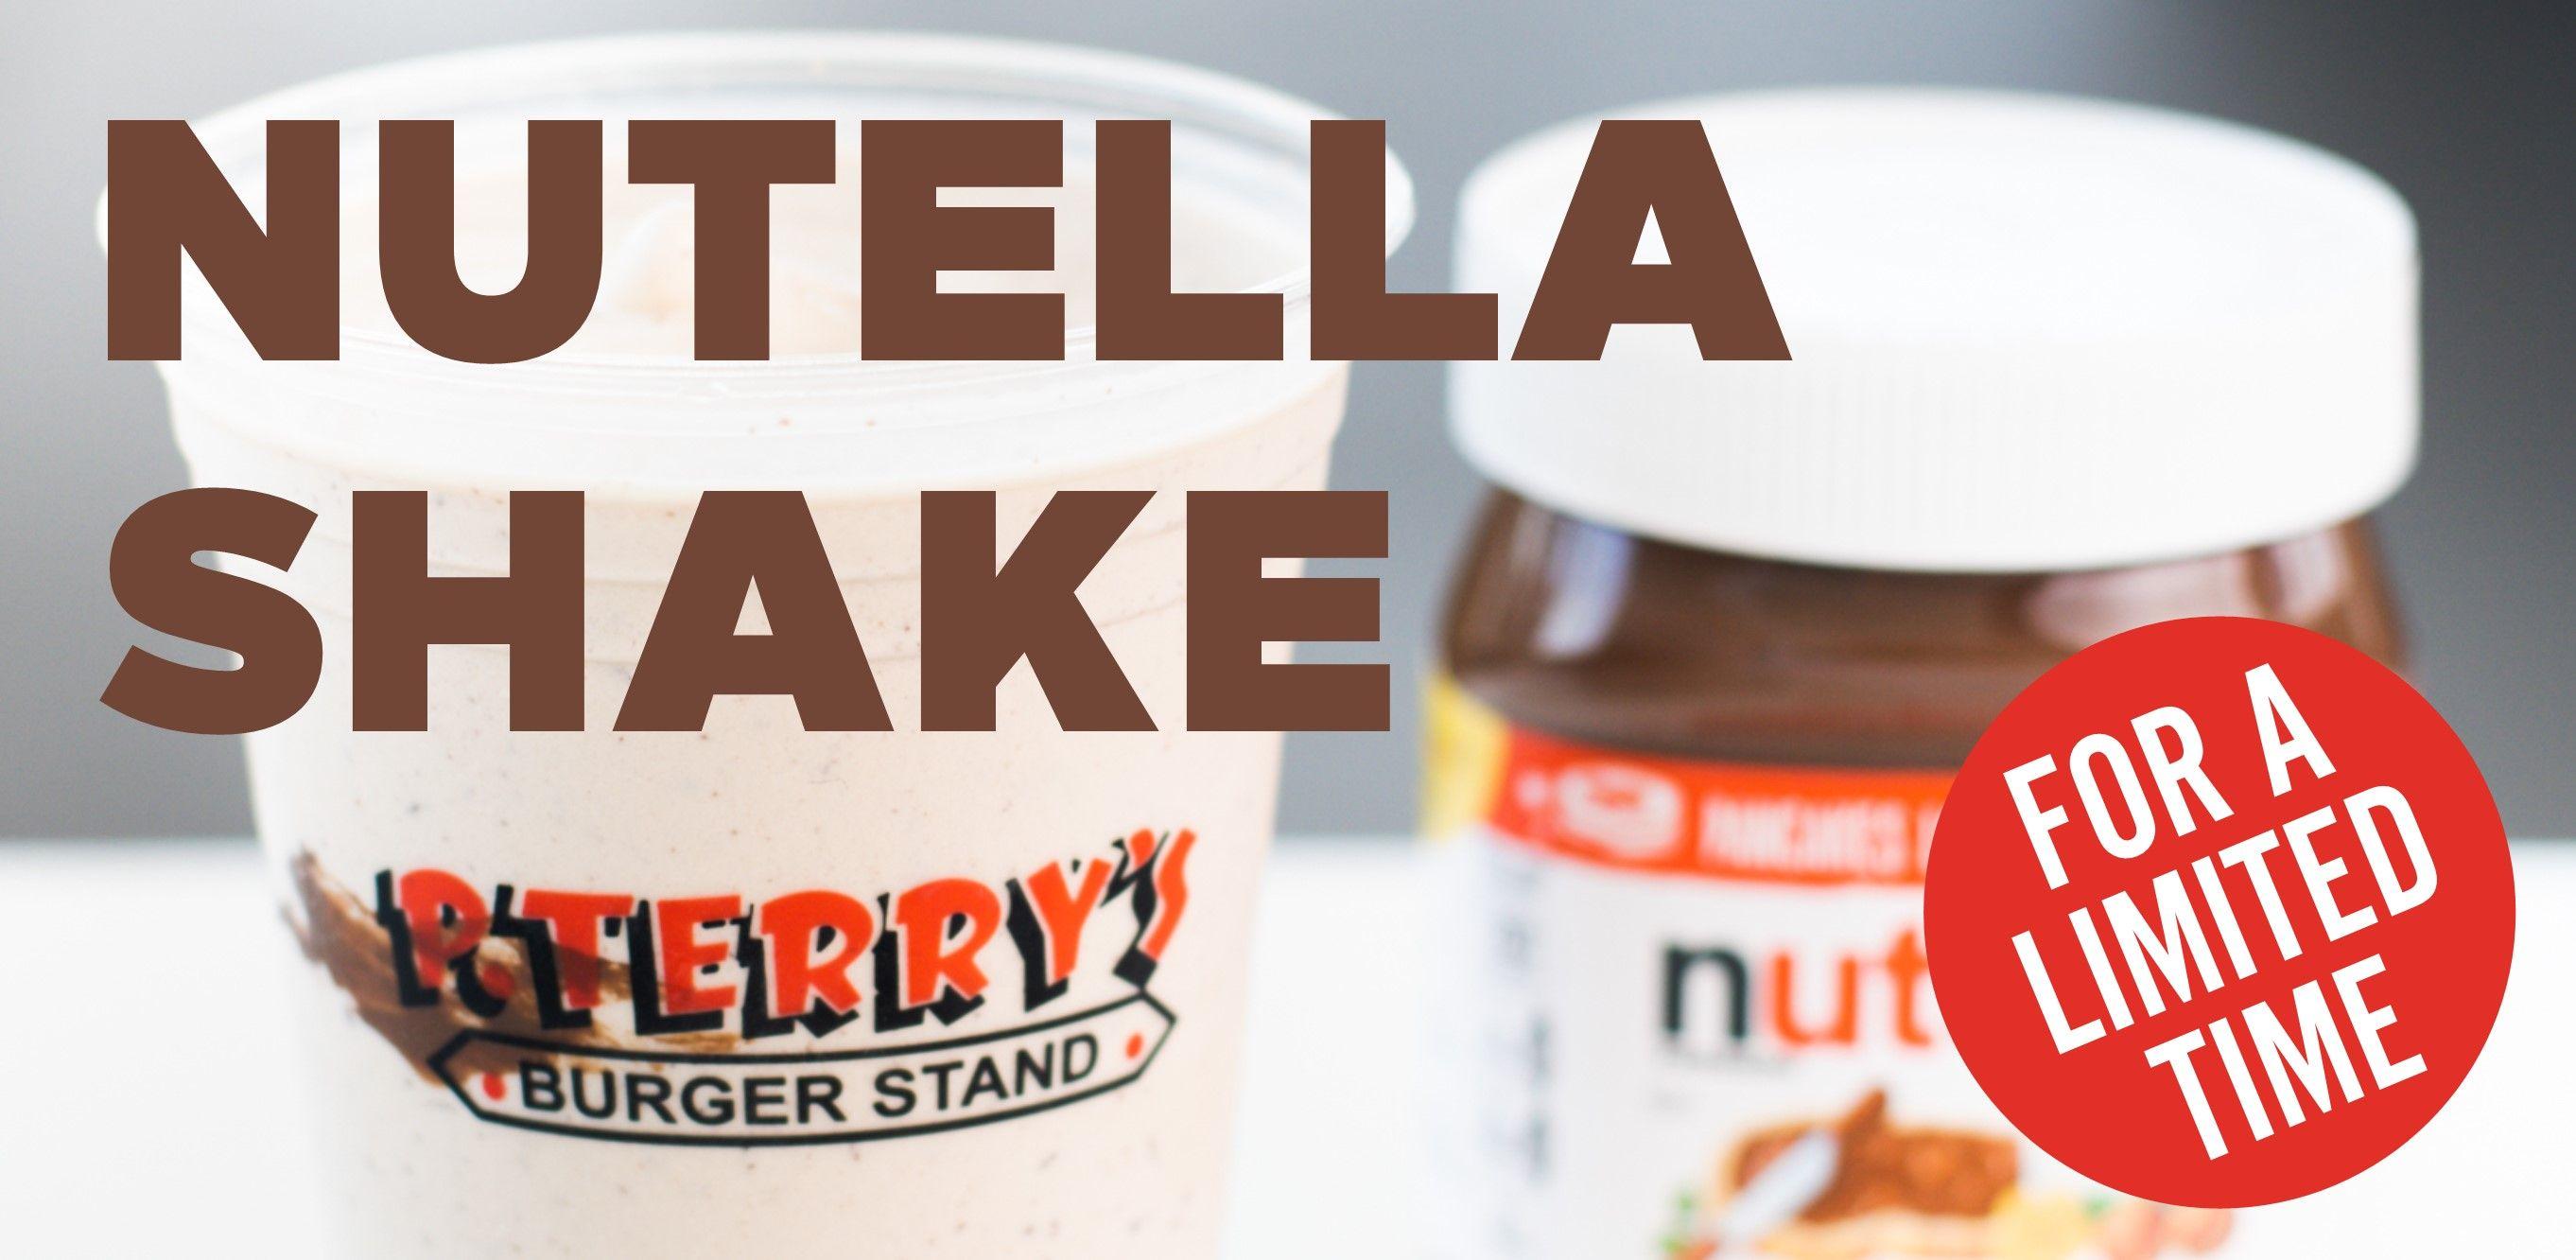 Nutella Shake!